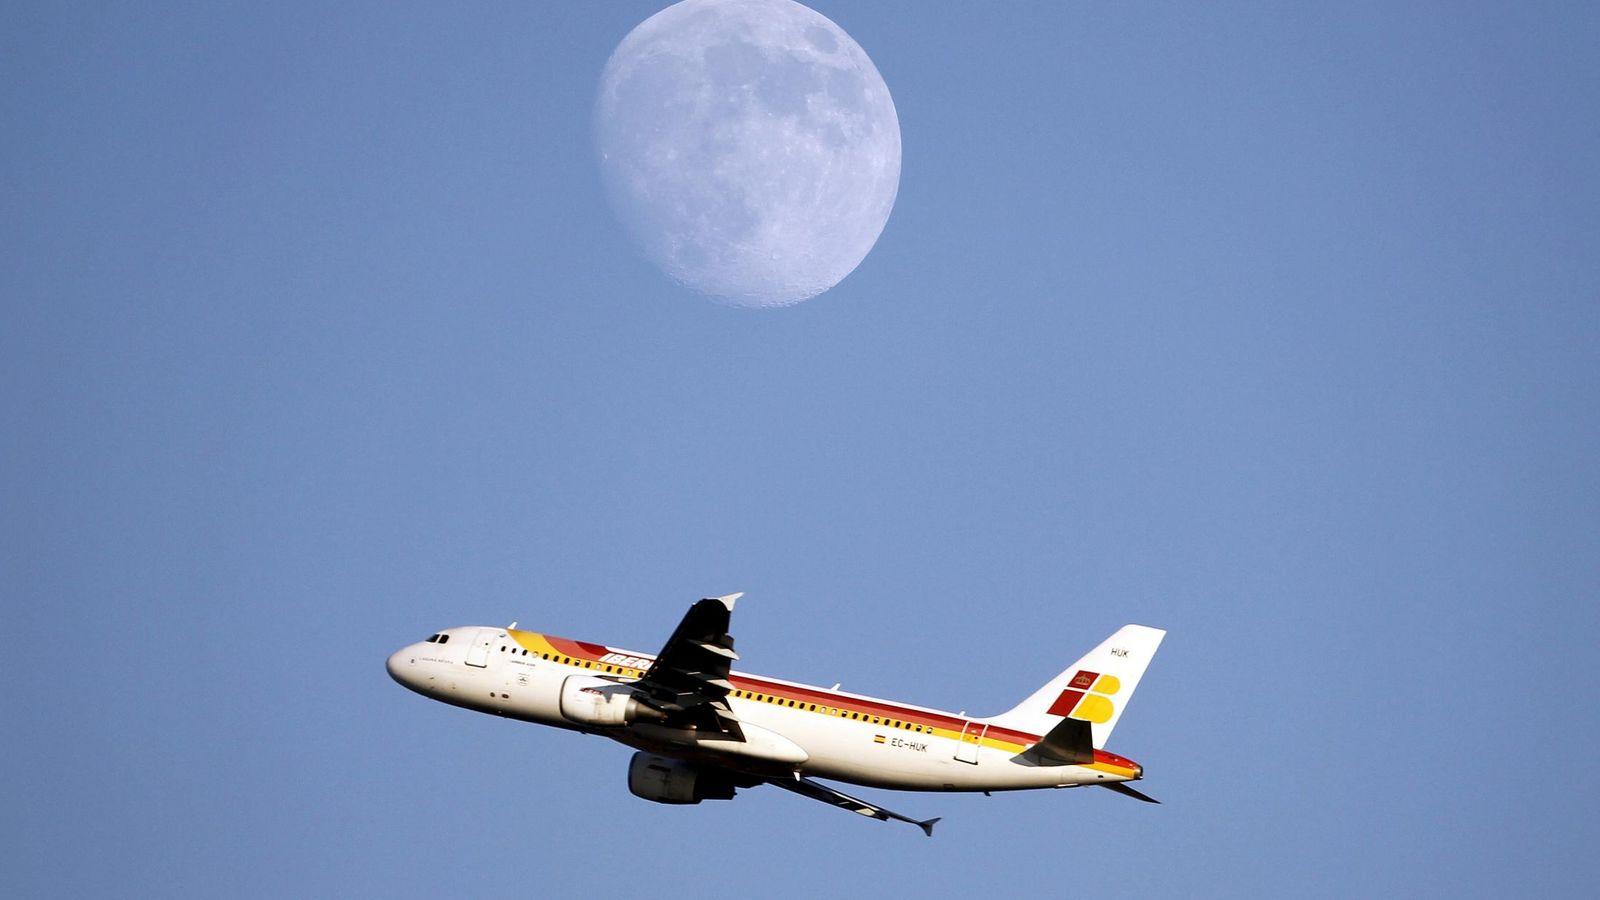 Foto: Un avión de Iberia, empresa incluida dentro del holding International Airlines Group (IAG). (Reuters)